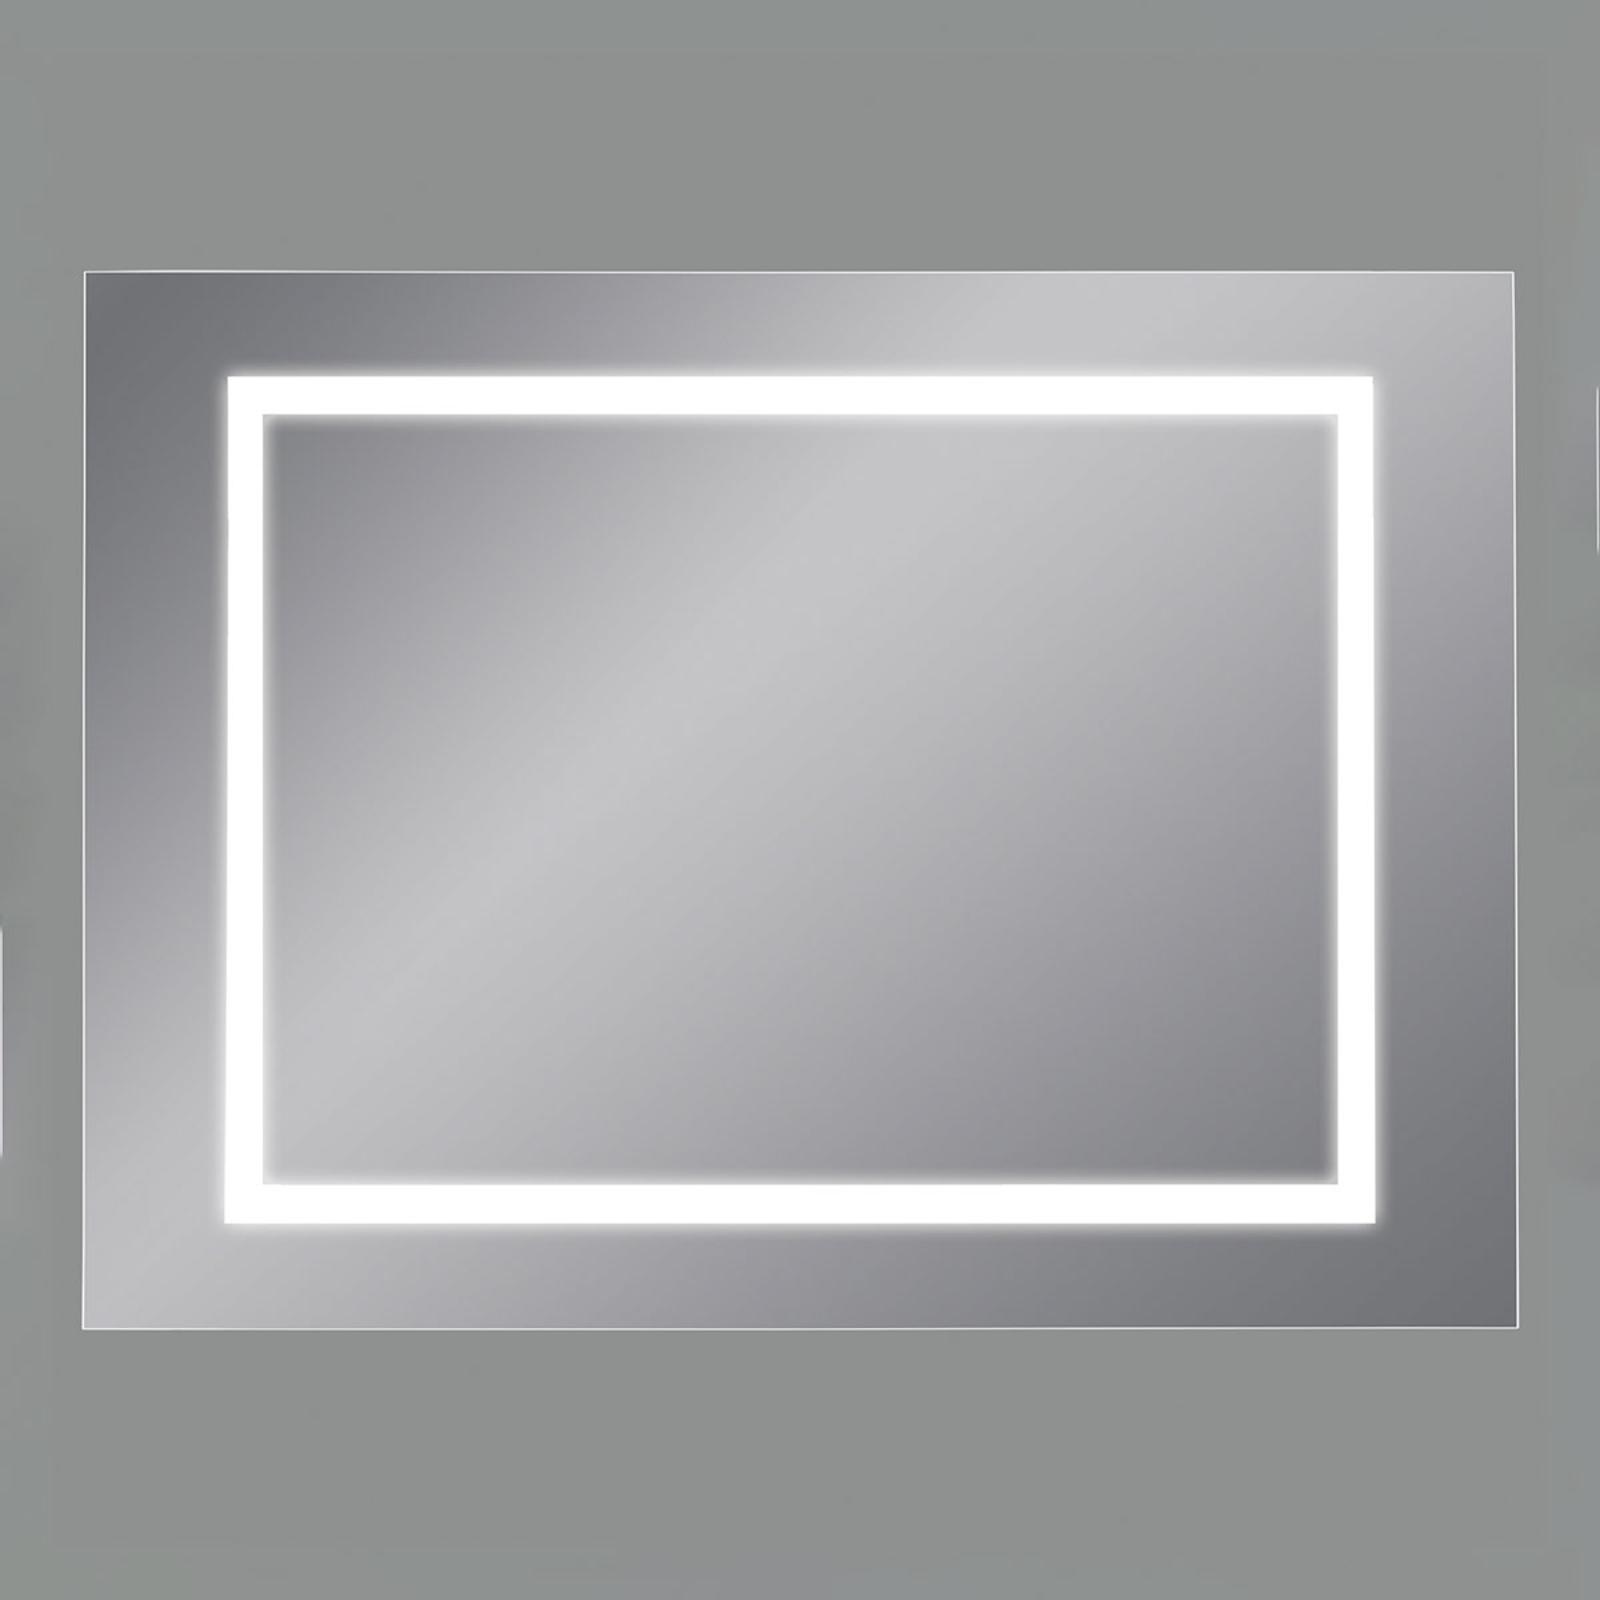 Miroir mural LED Mul, 110x75cm, 4000K